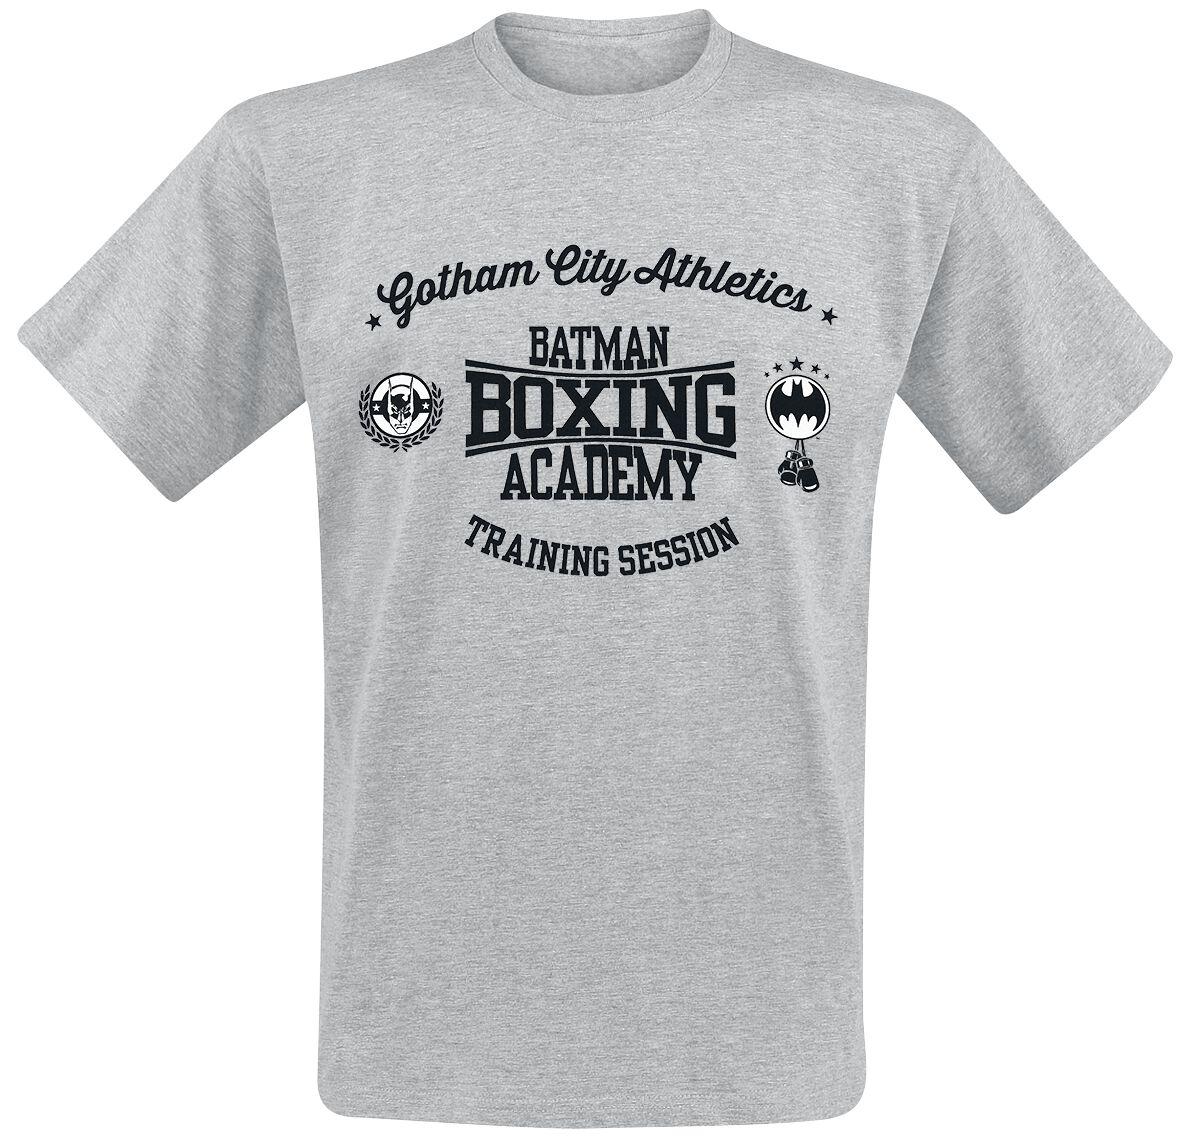 Image of   Batman Boxing Academy T-Shirt grålig